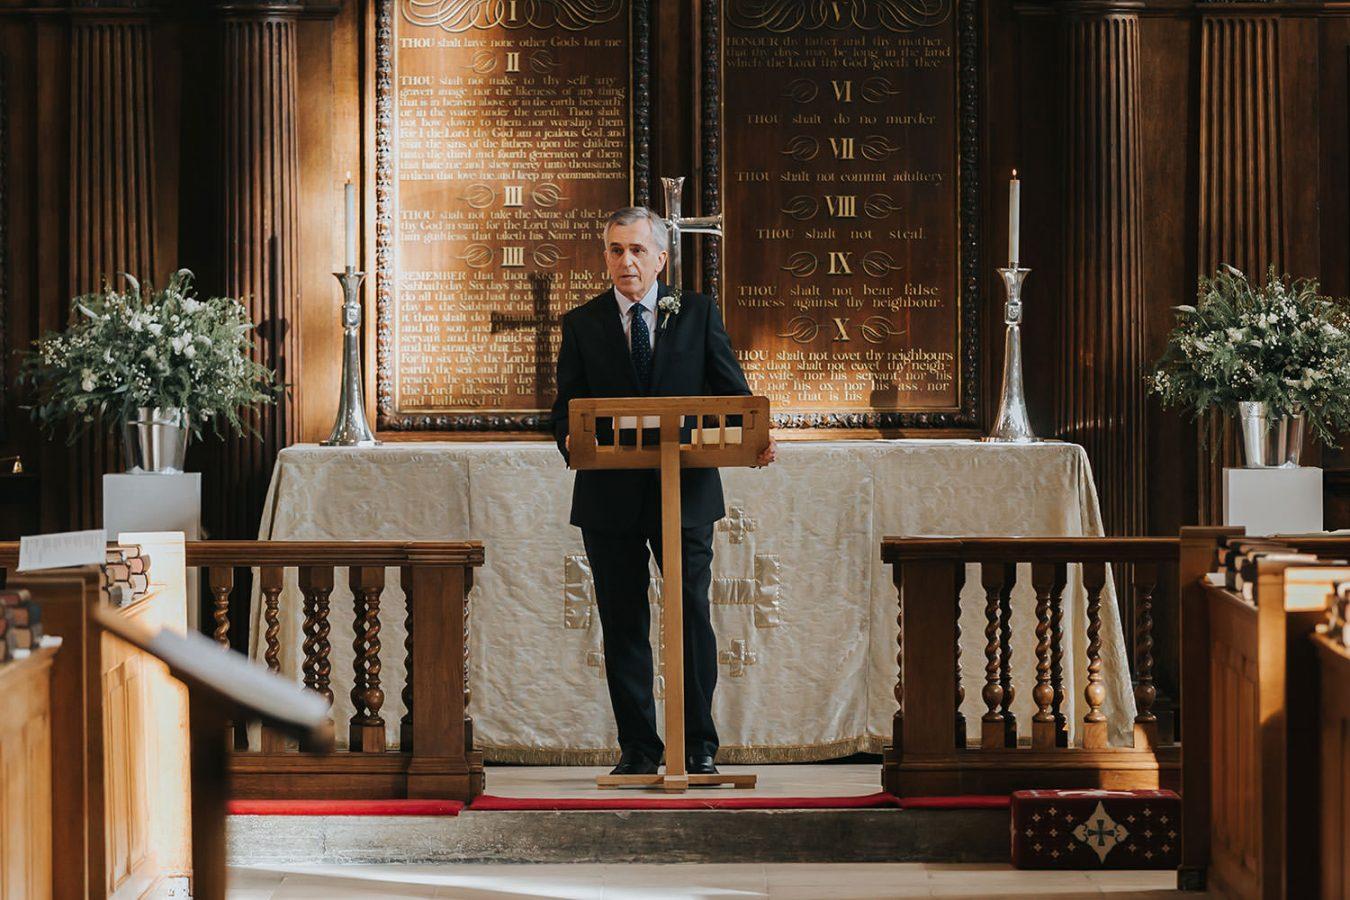 temple-church-london-wedding22